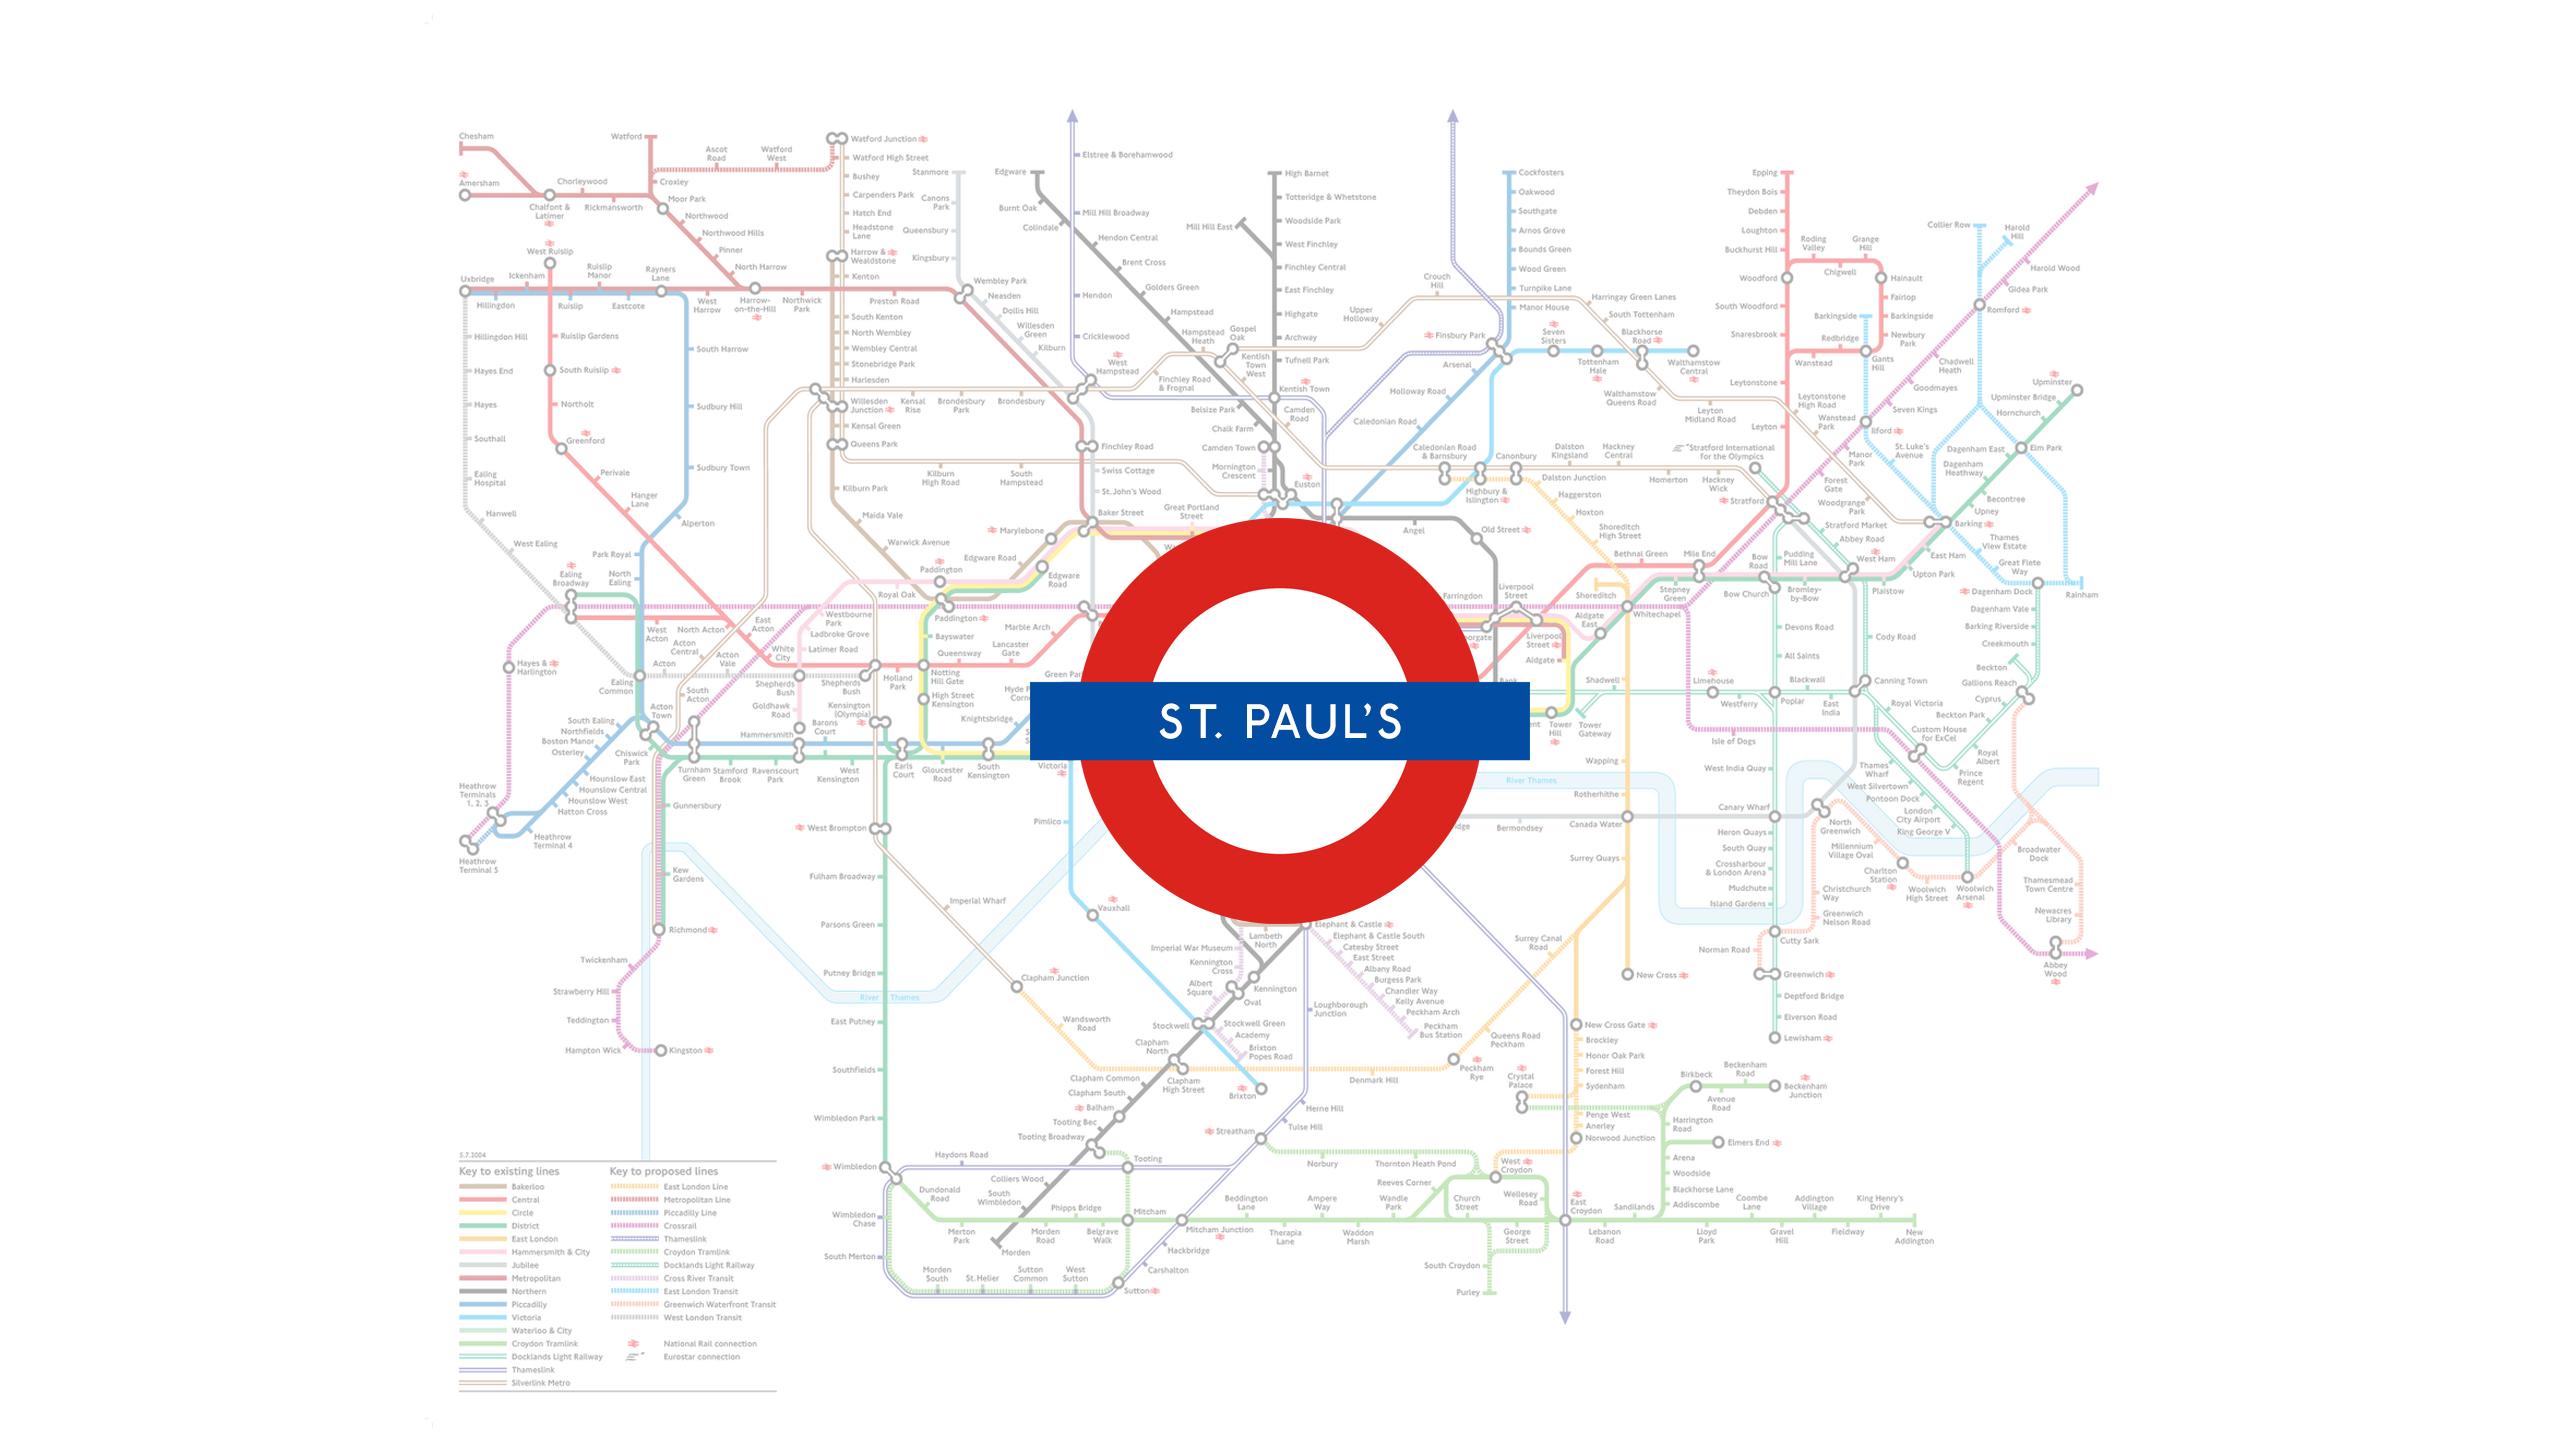 St. Paul's (Map)